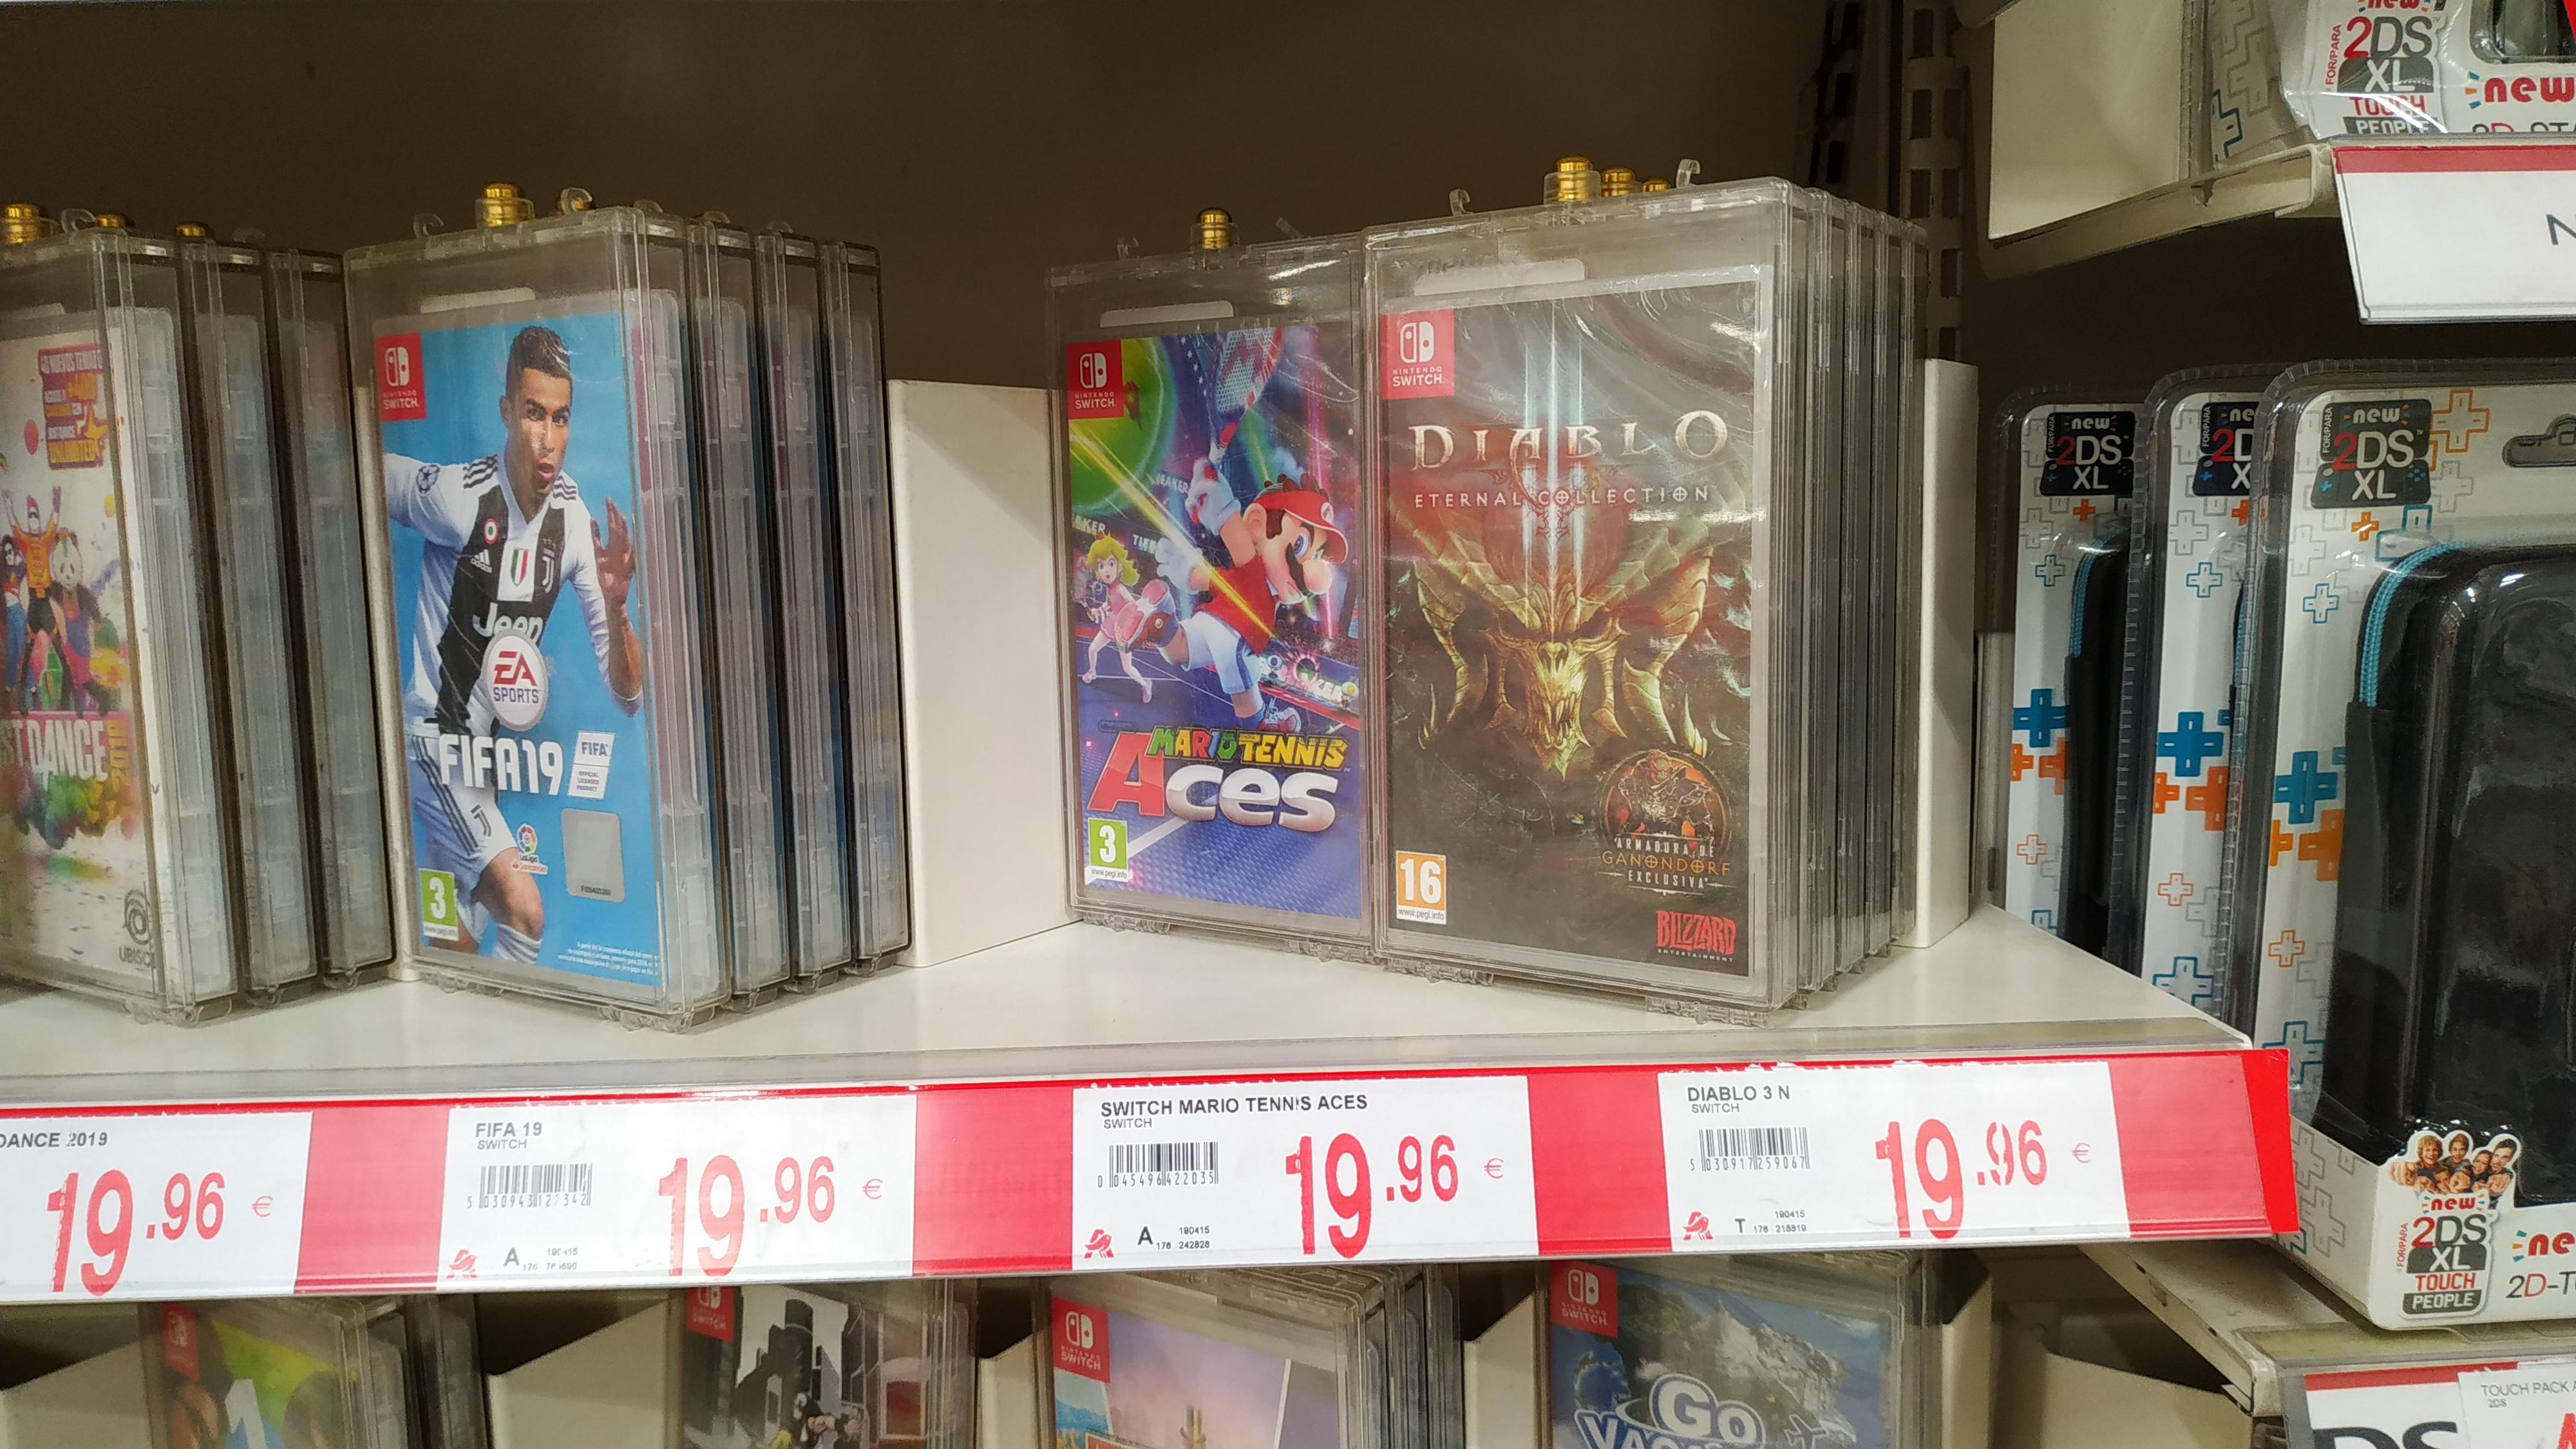 Videojuegos Nintendo Switch a 19,96 Alcampo de Vallecas